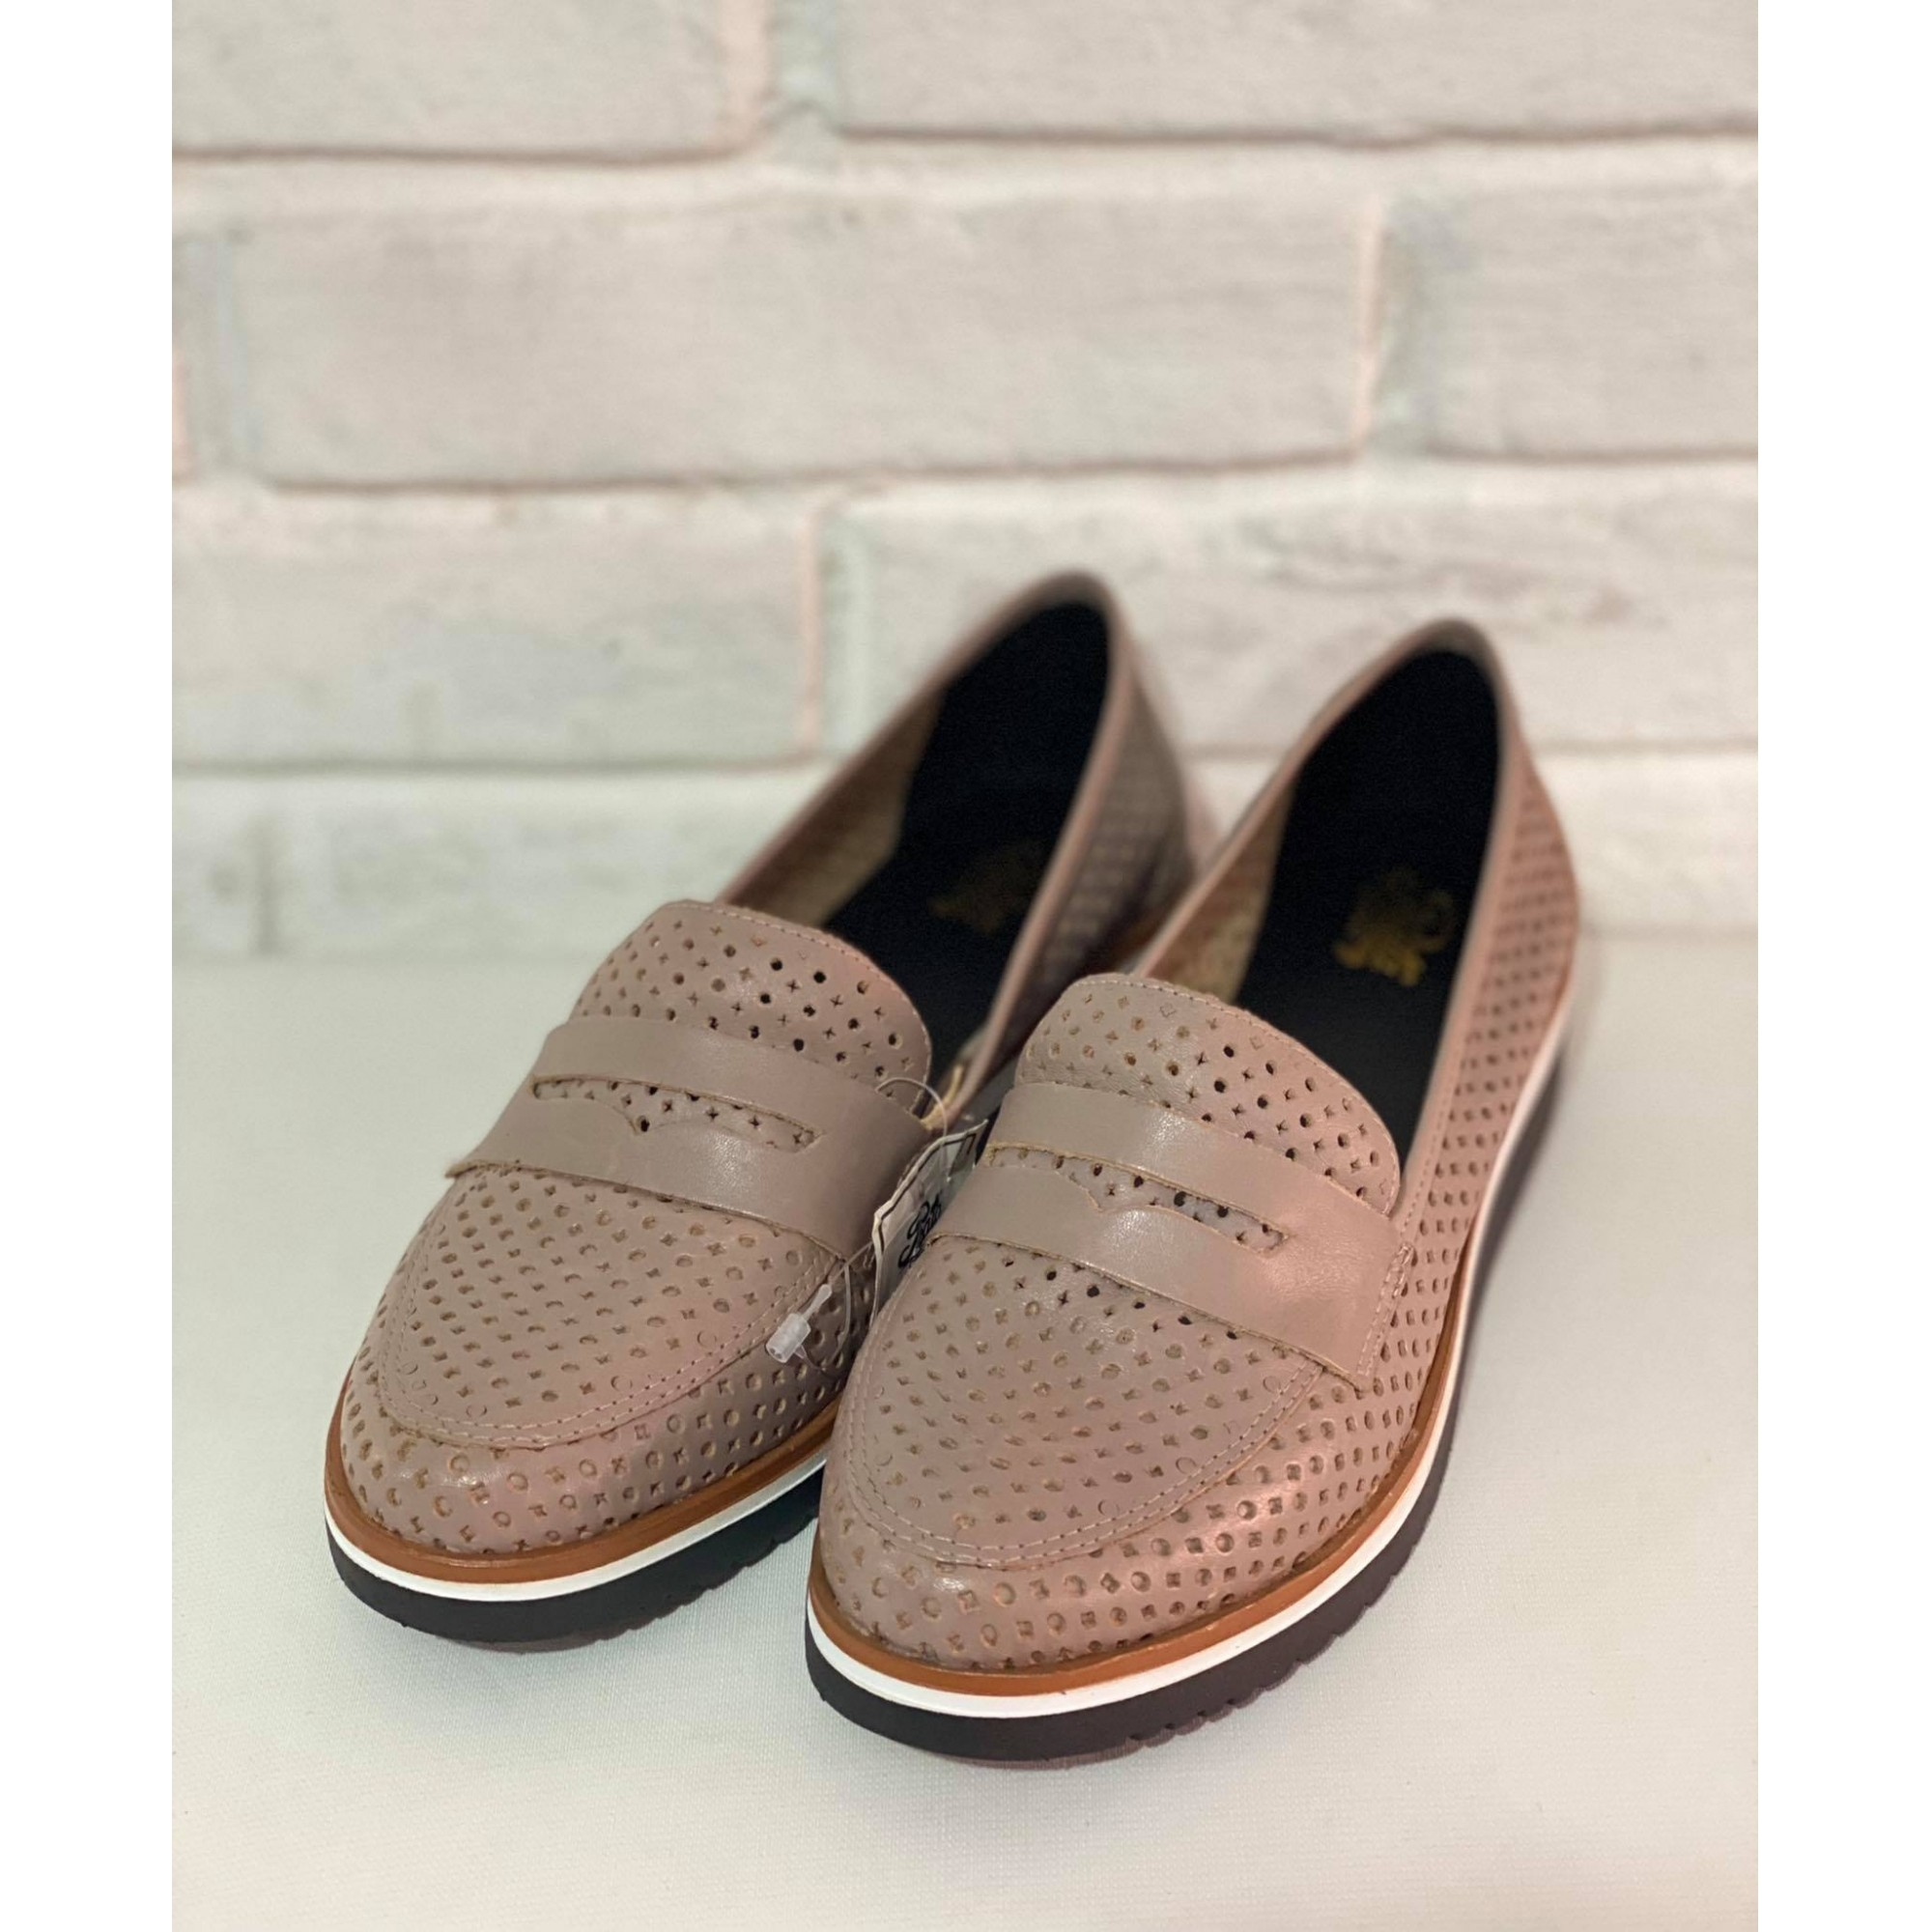 Sapato Feminino Prata Couro 1009513 Sepia